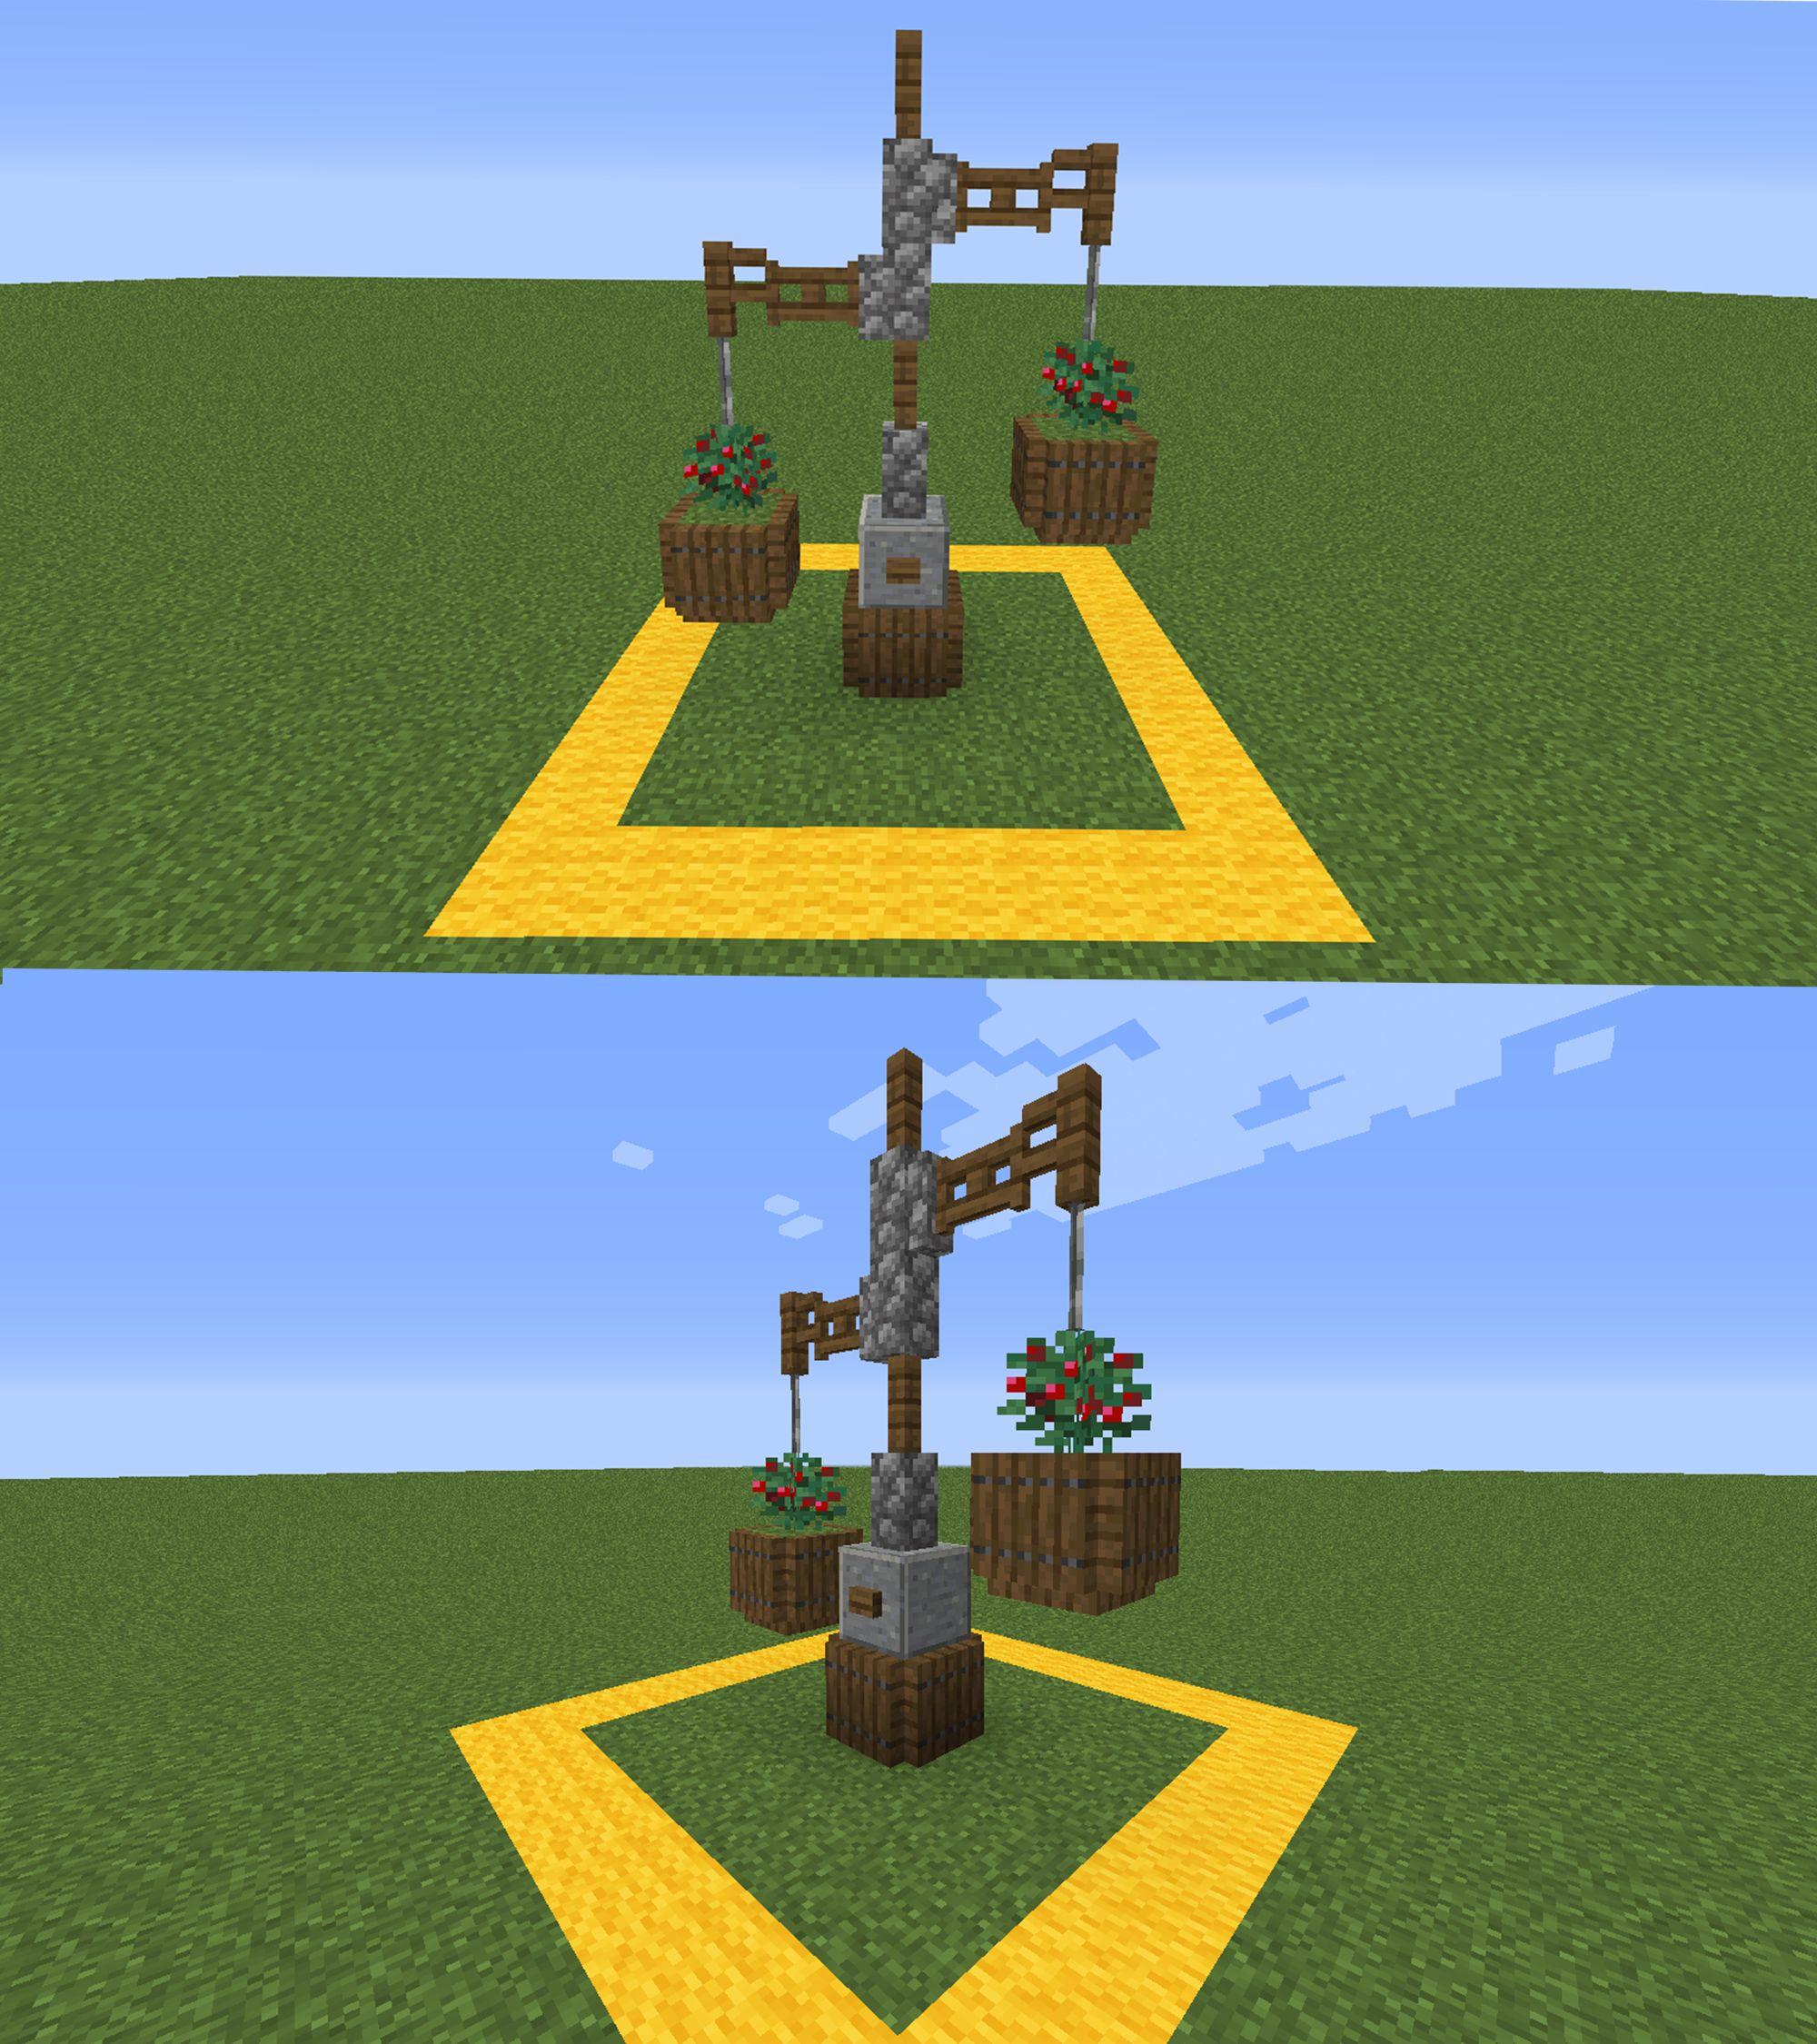 Minecraft Decorations By Rebecca Barhorst On Minecraft